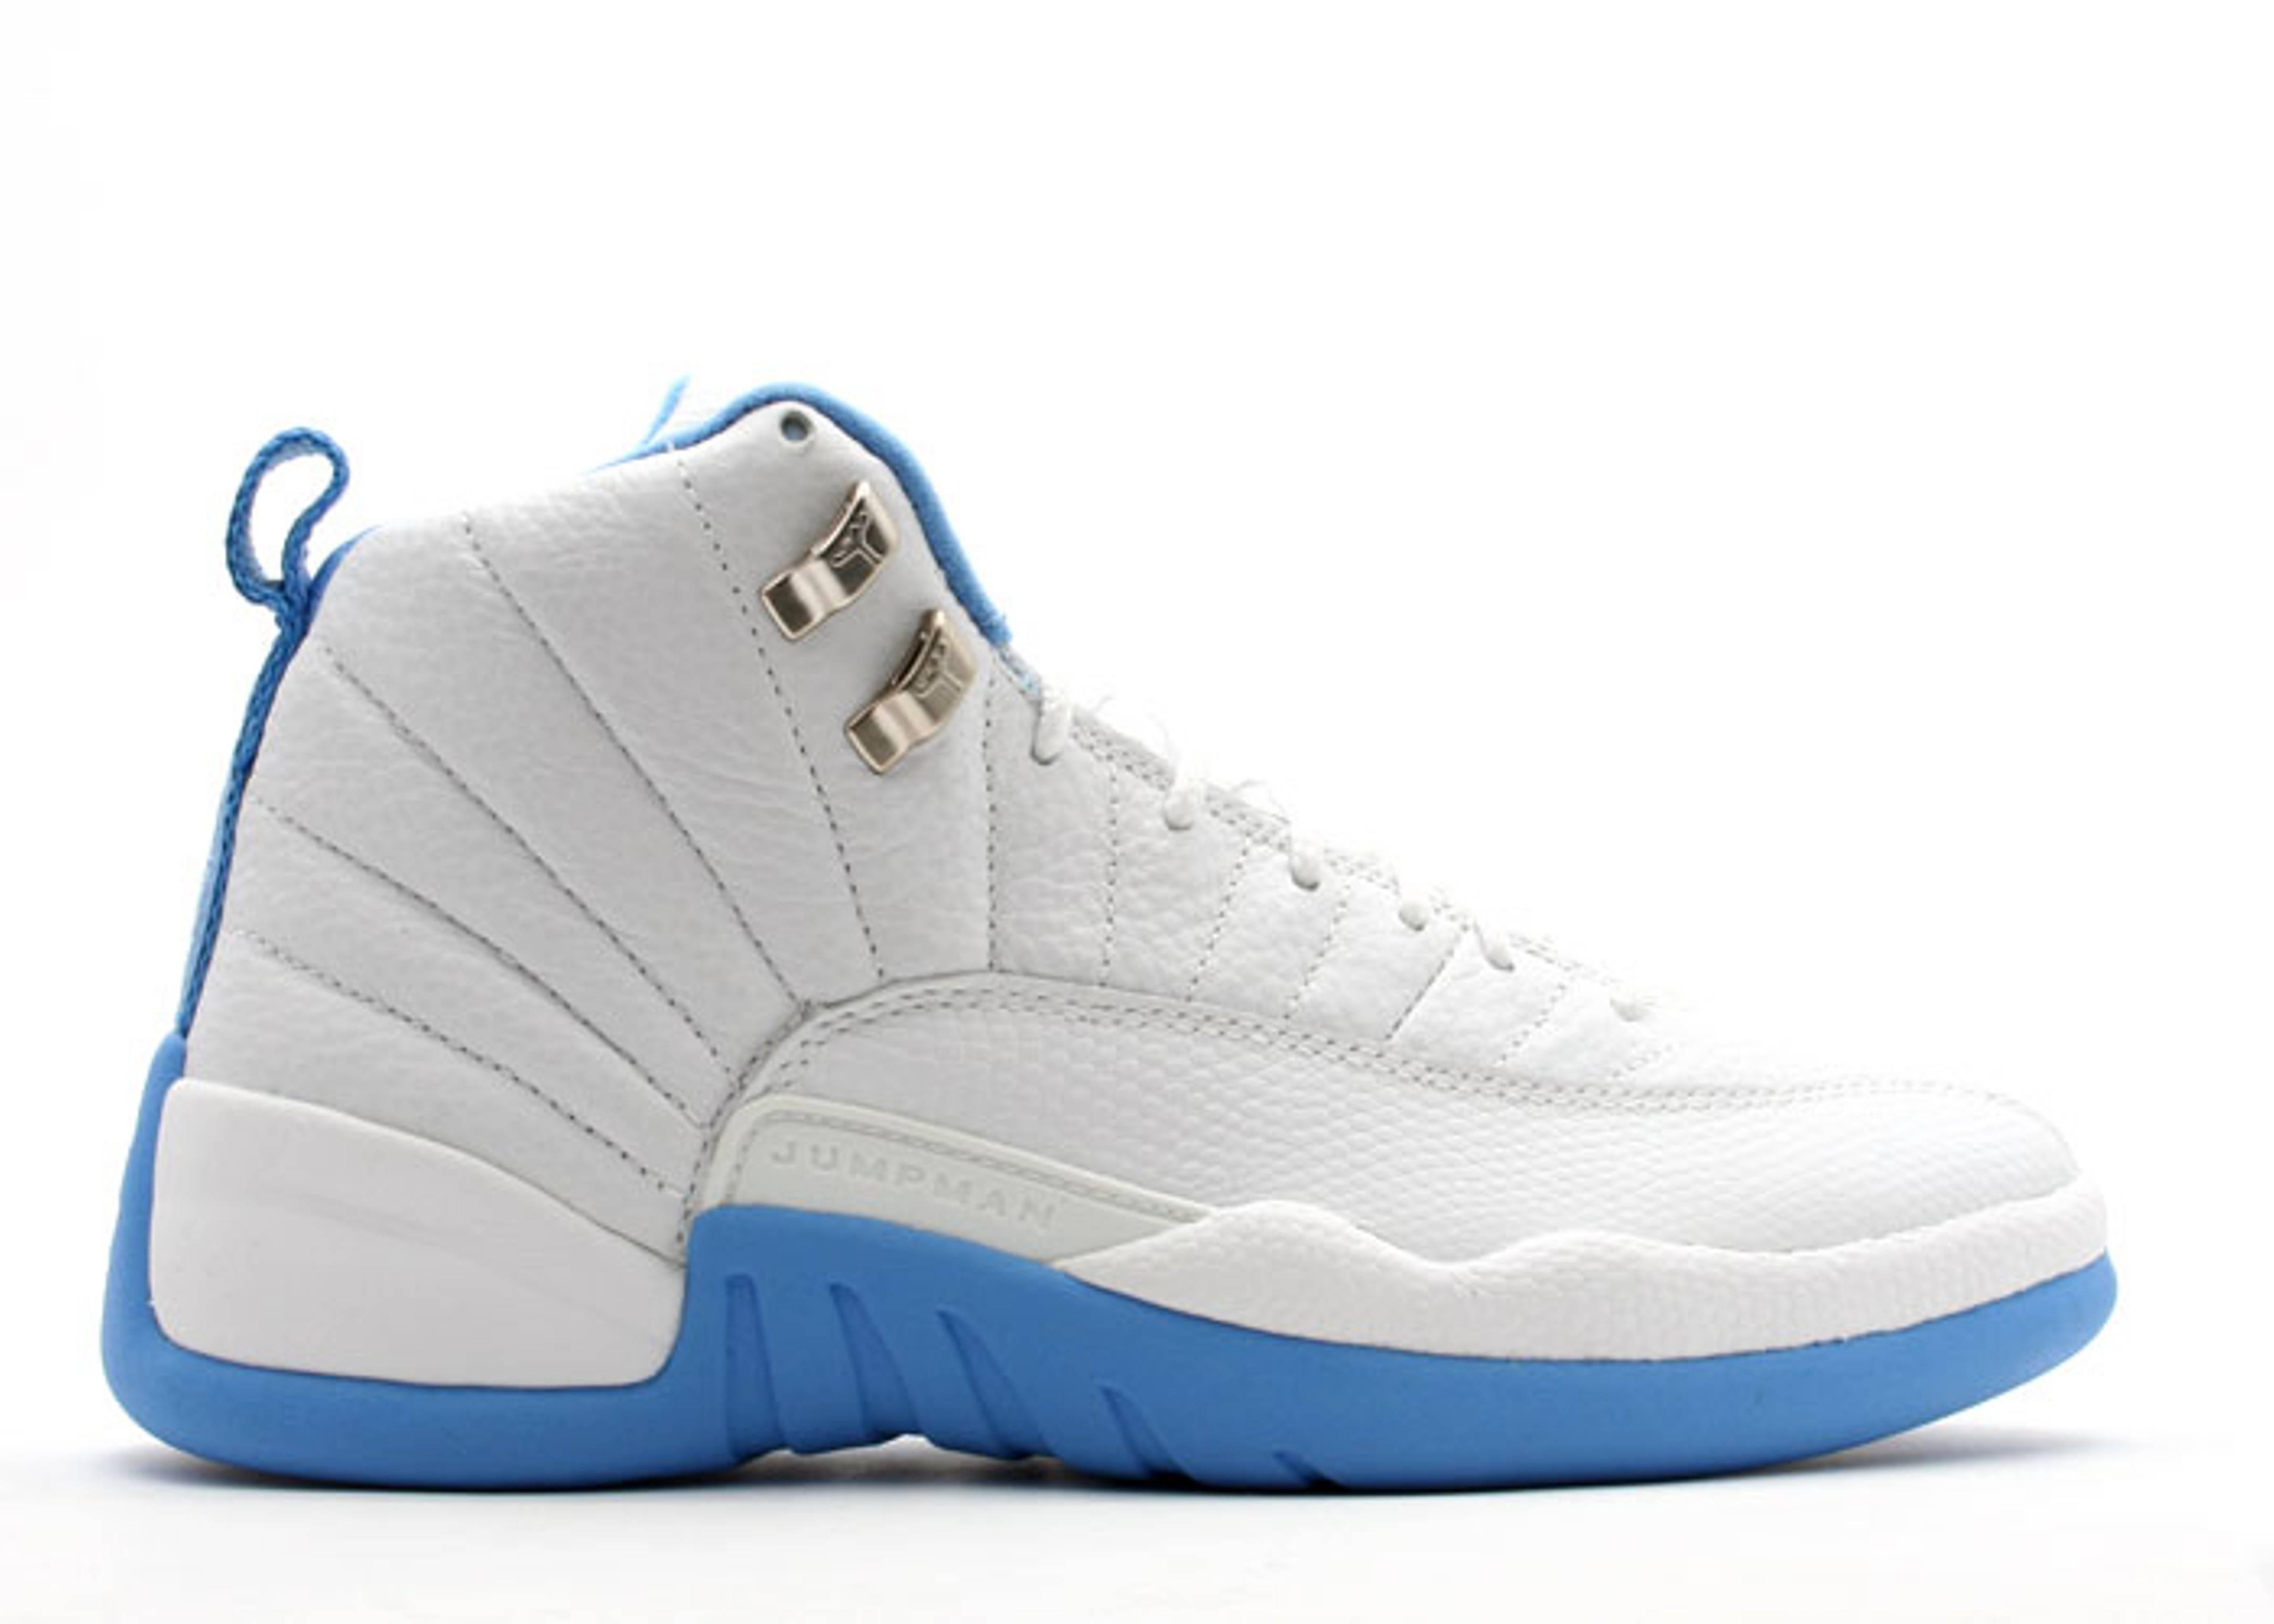 308243 142 Air Jordan 12 Retro Womens White University Blue Shoes